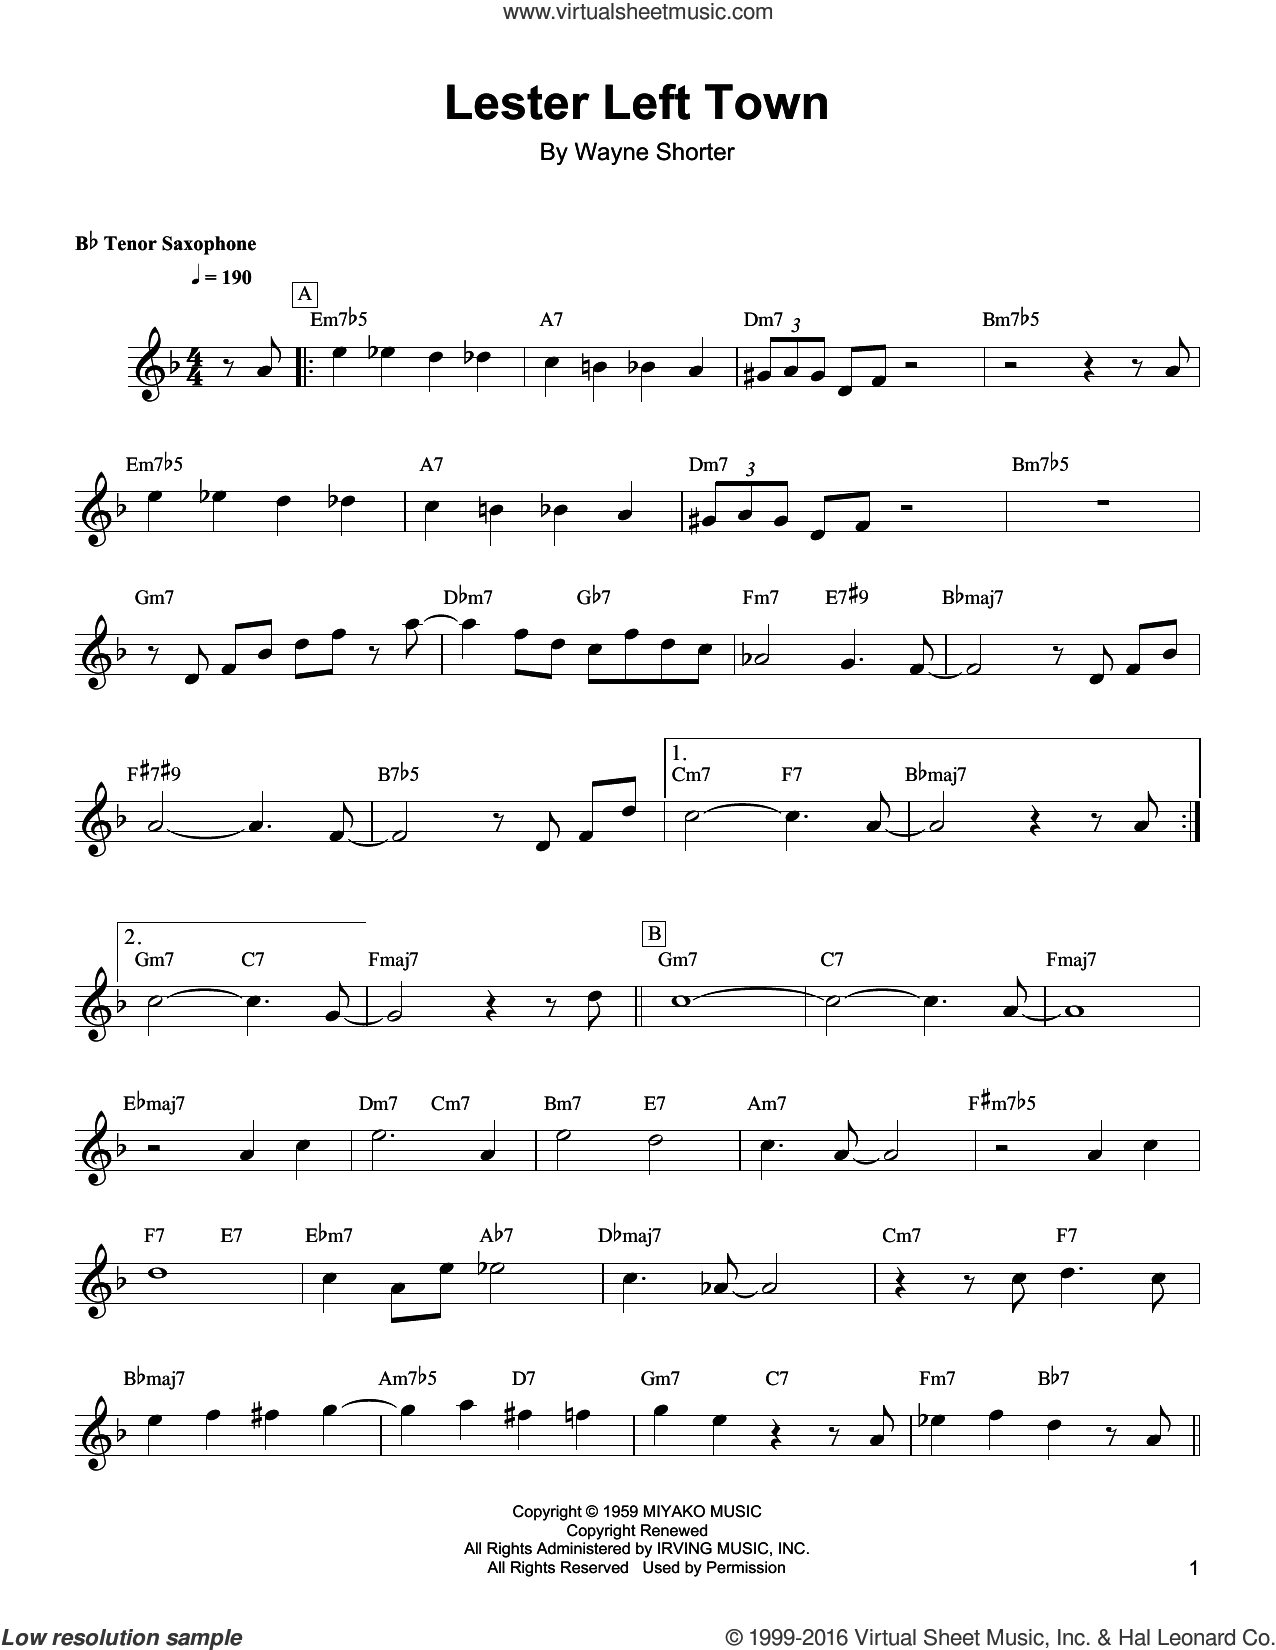 Lester Left Town sheet music for tenor saxophone solo (transcription) by Wayne Shorter, intermediate tenor saxophone (transcription)